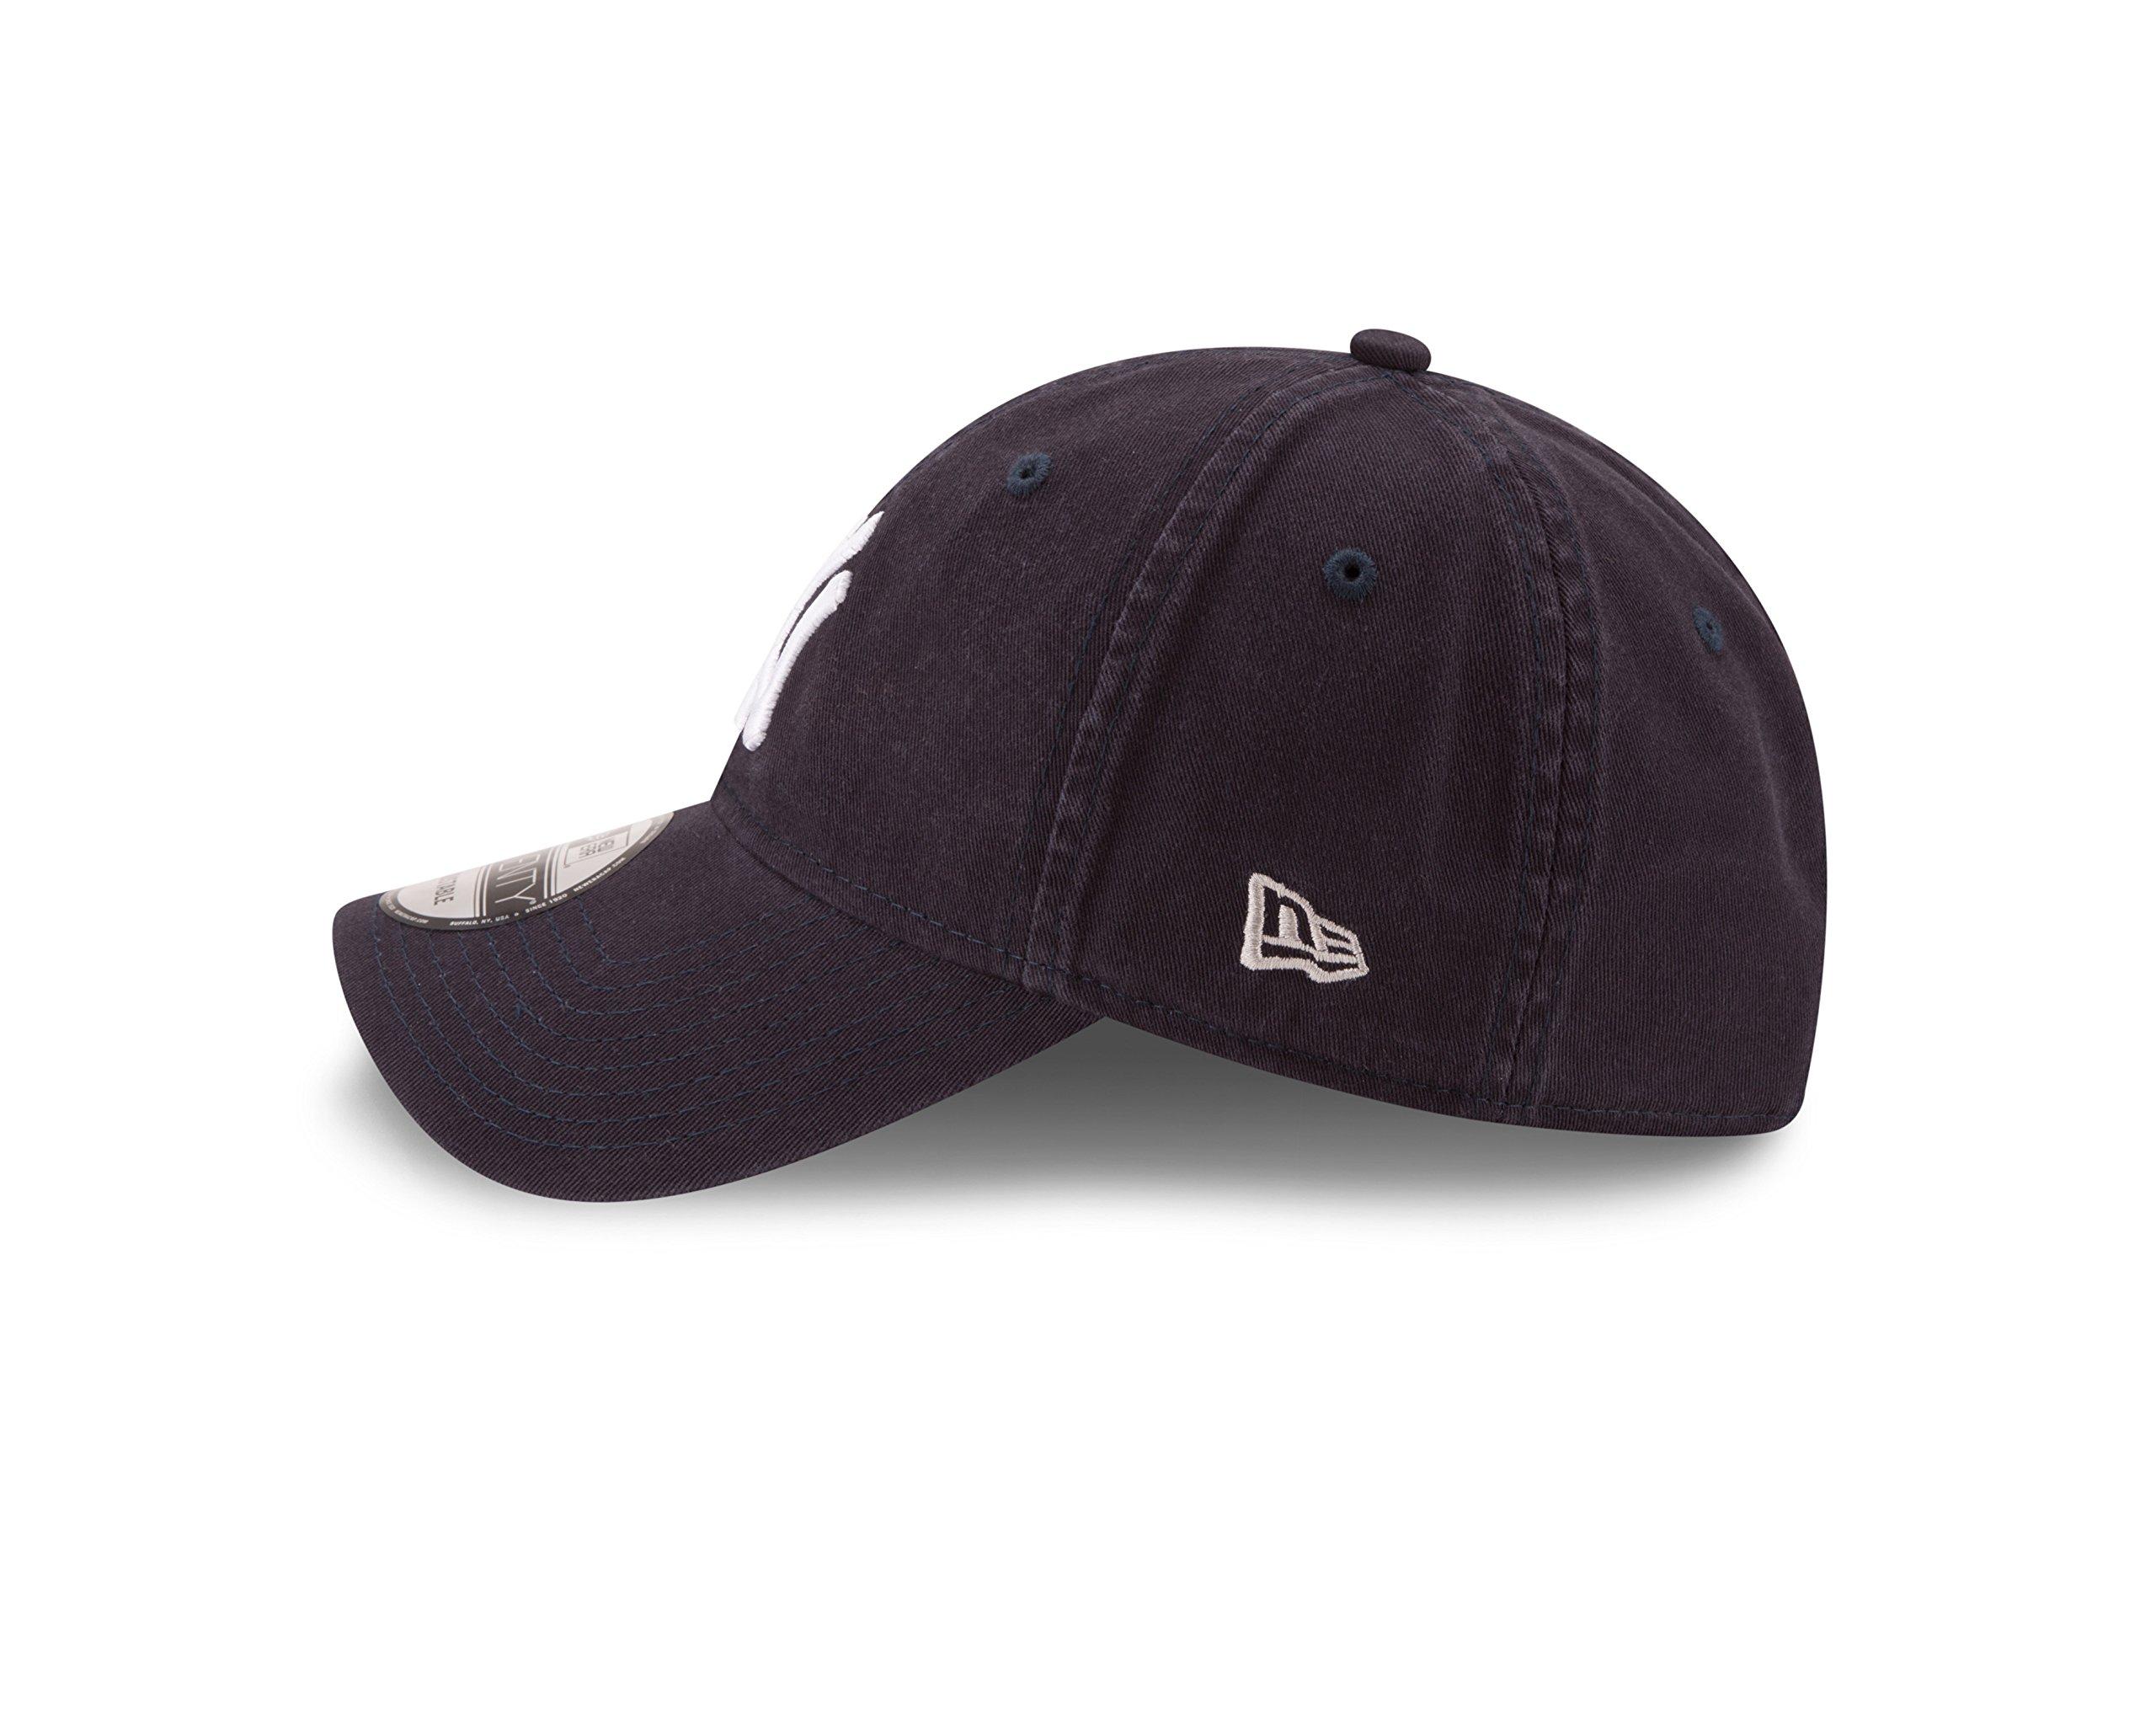 New Era New York Yankees MLB Core Classic 9TWENTY Adjustable Cap Navy by New Era (Image #4)